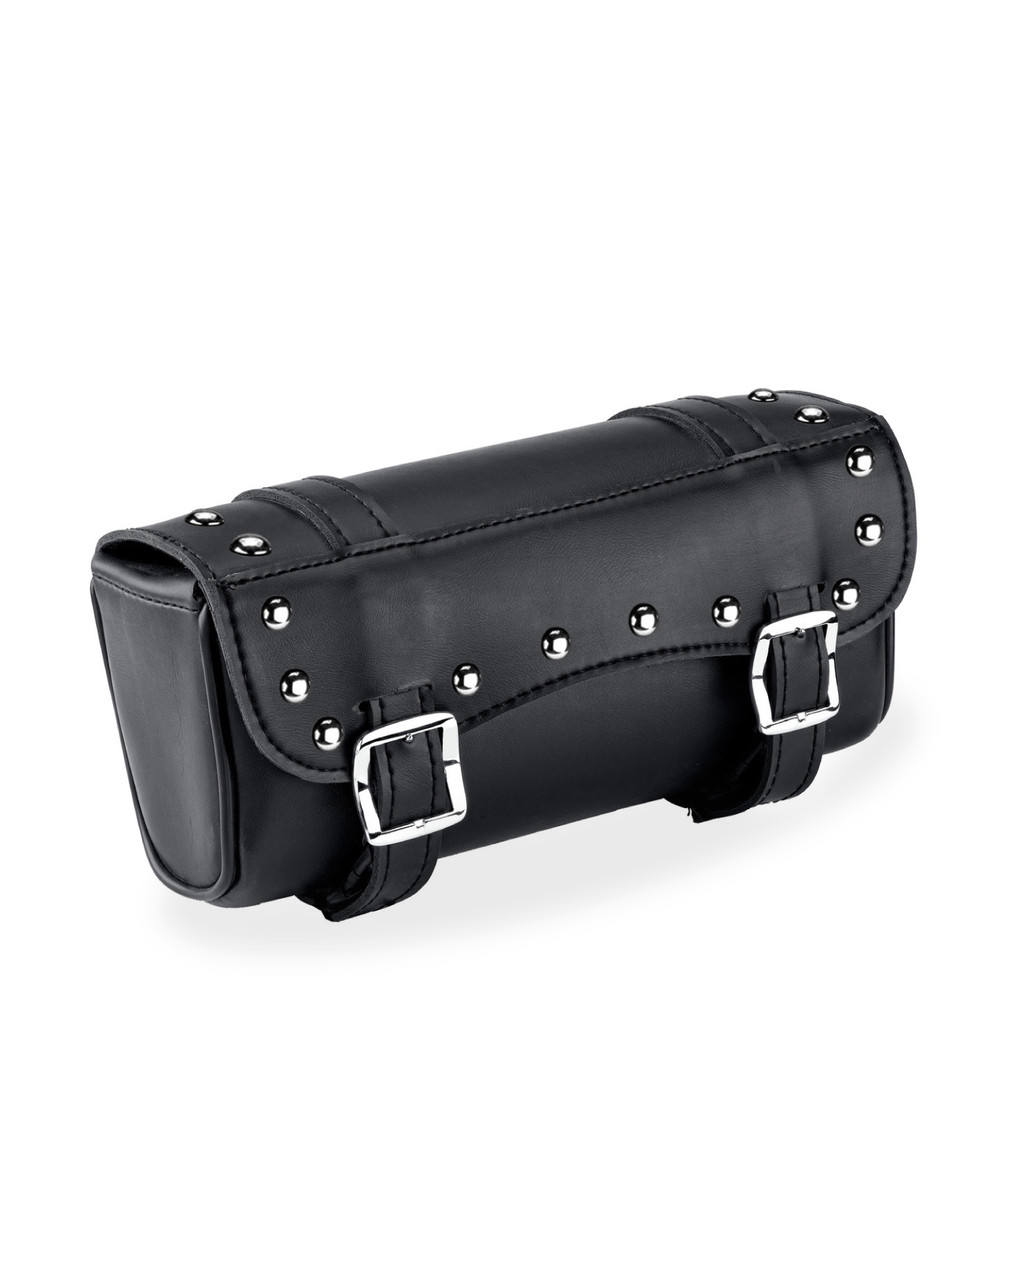 Kawasaki Medium Universal Studded Motorcycle Tool Bag Main Bag View